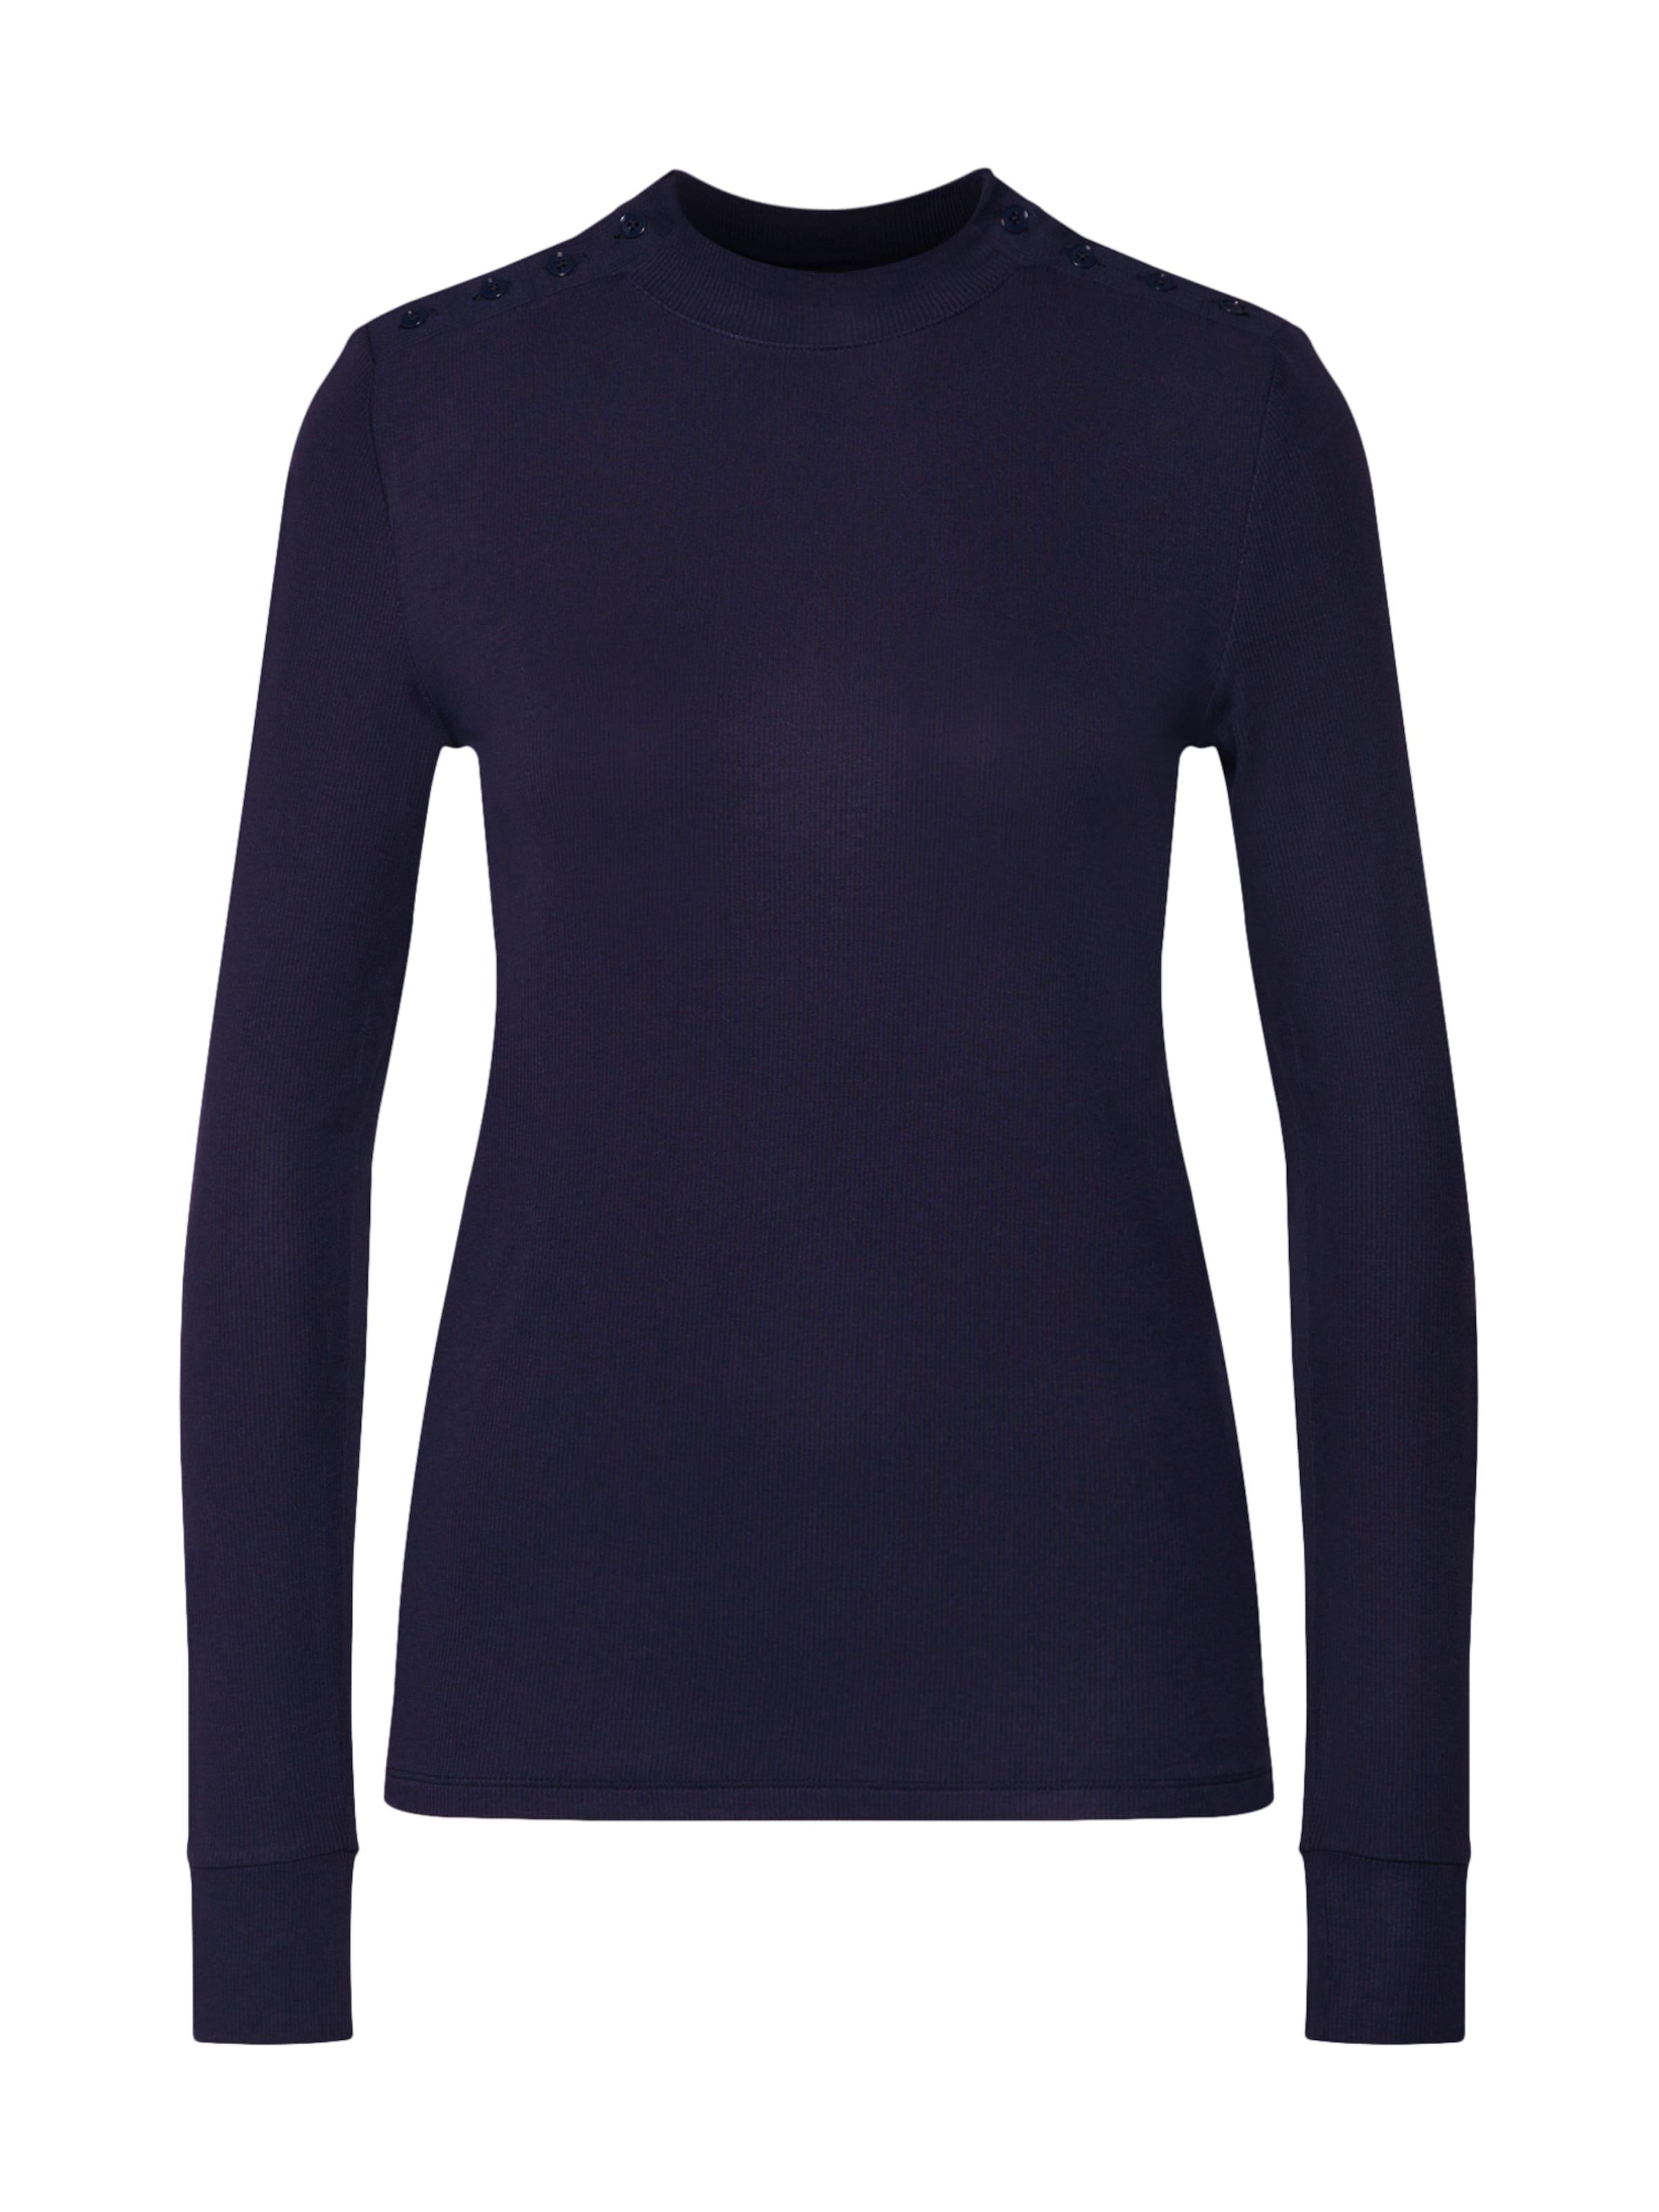 Bttn Tee' T Gap shirt 'ls Bleu Shldr Marine En N8wymnO0v